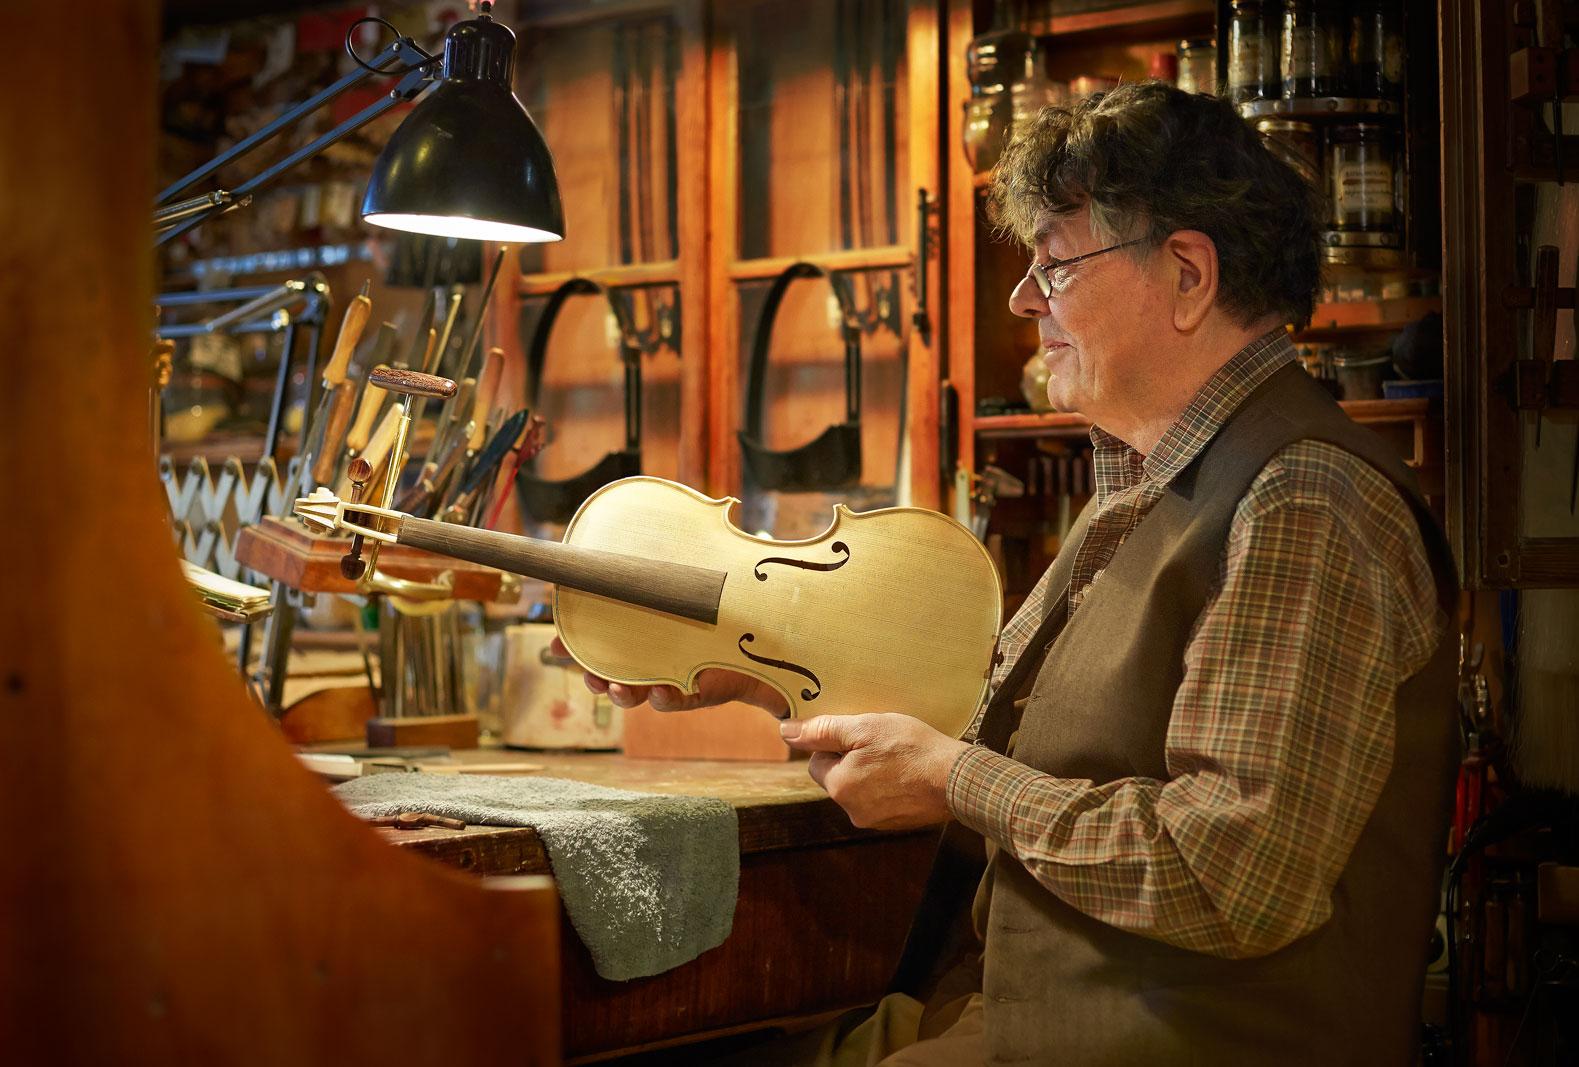 Geige Hand Konstruktion Malen Farbe Geigenbau Handwerl Instrumentenkonstruktion Holz